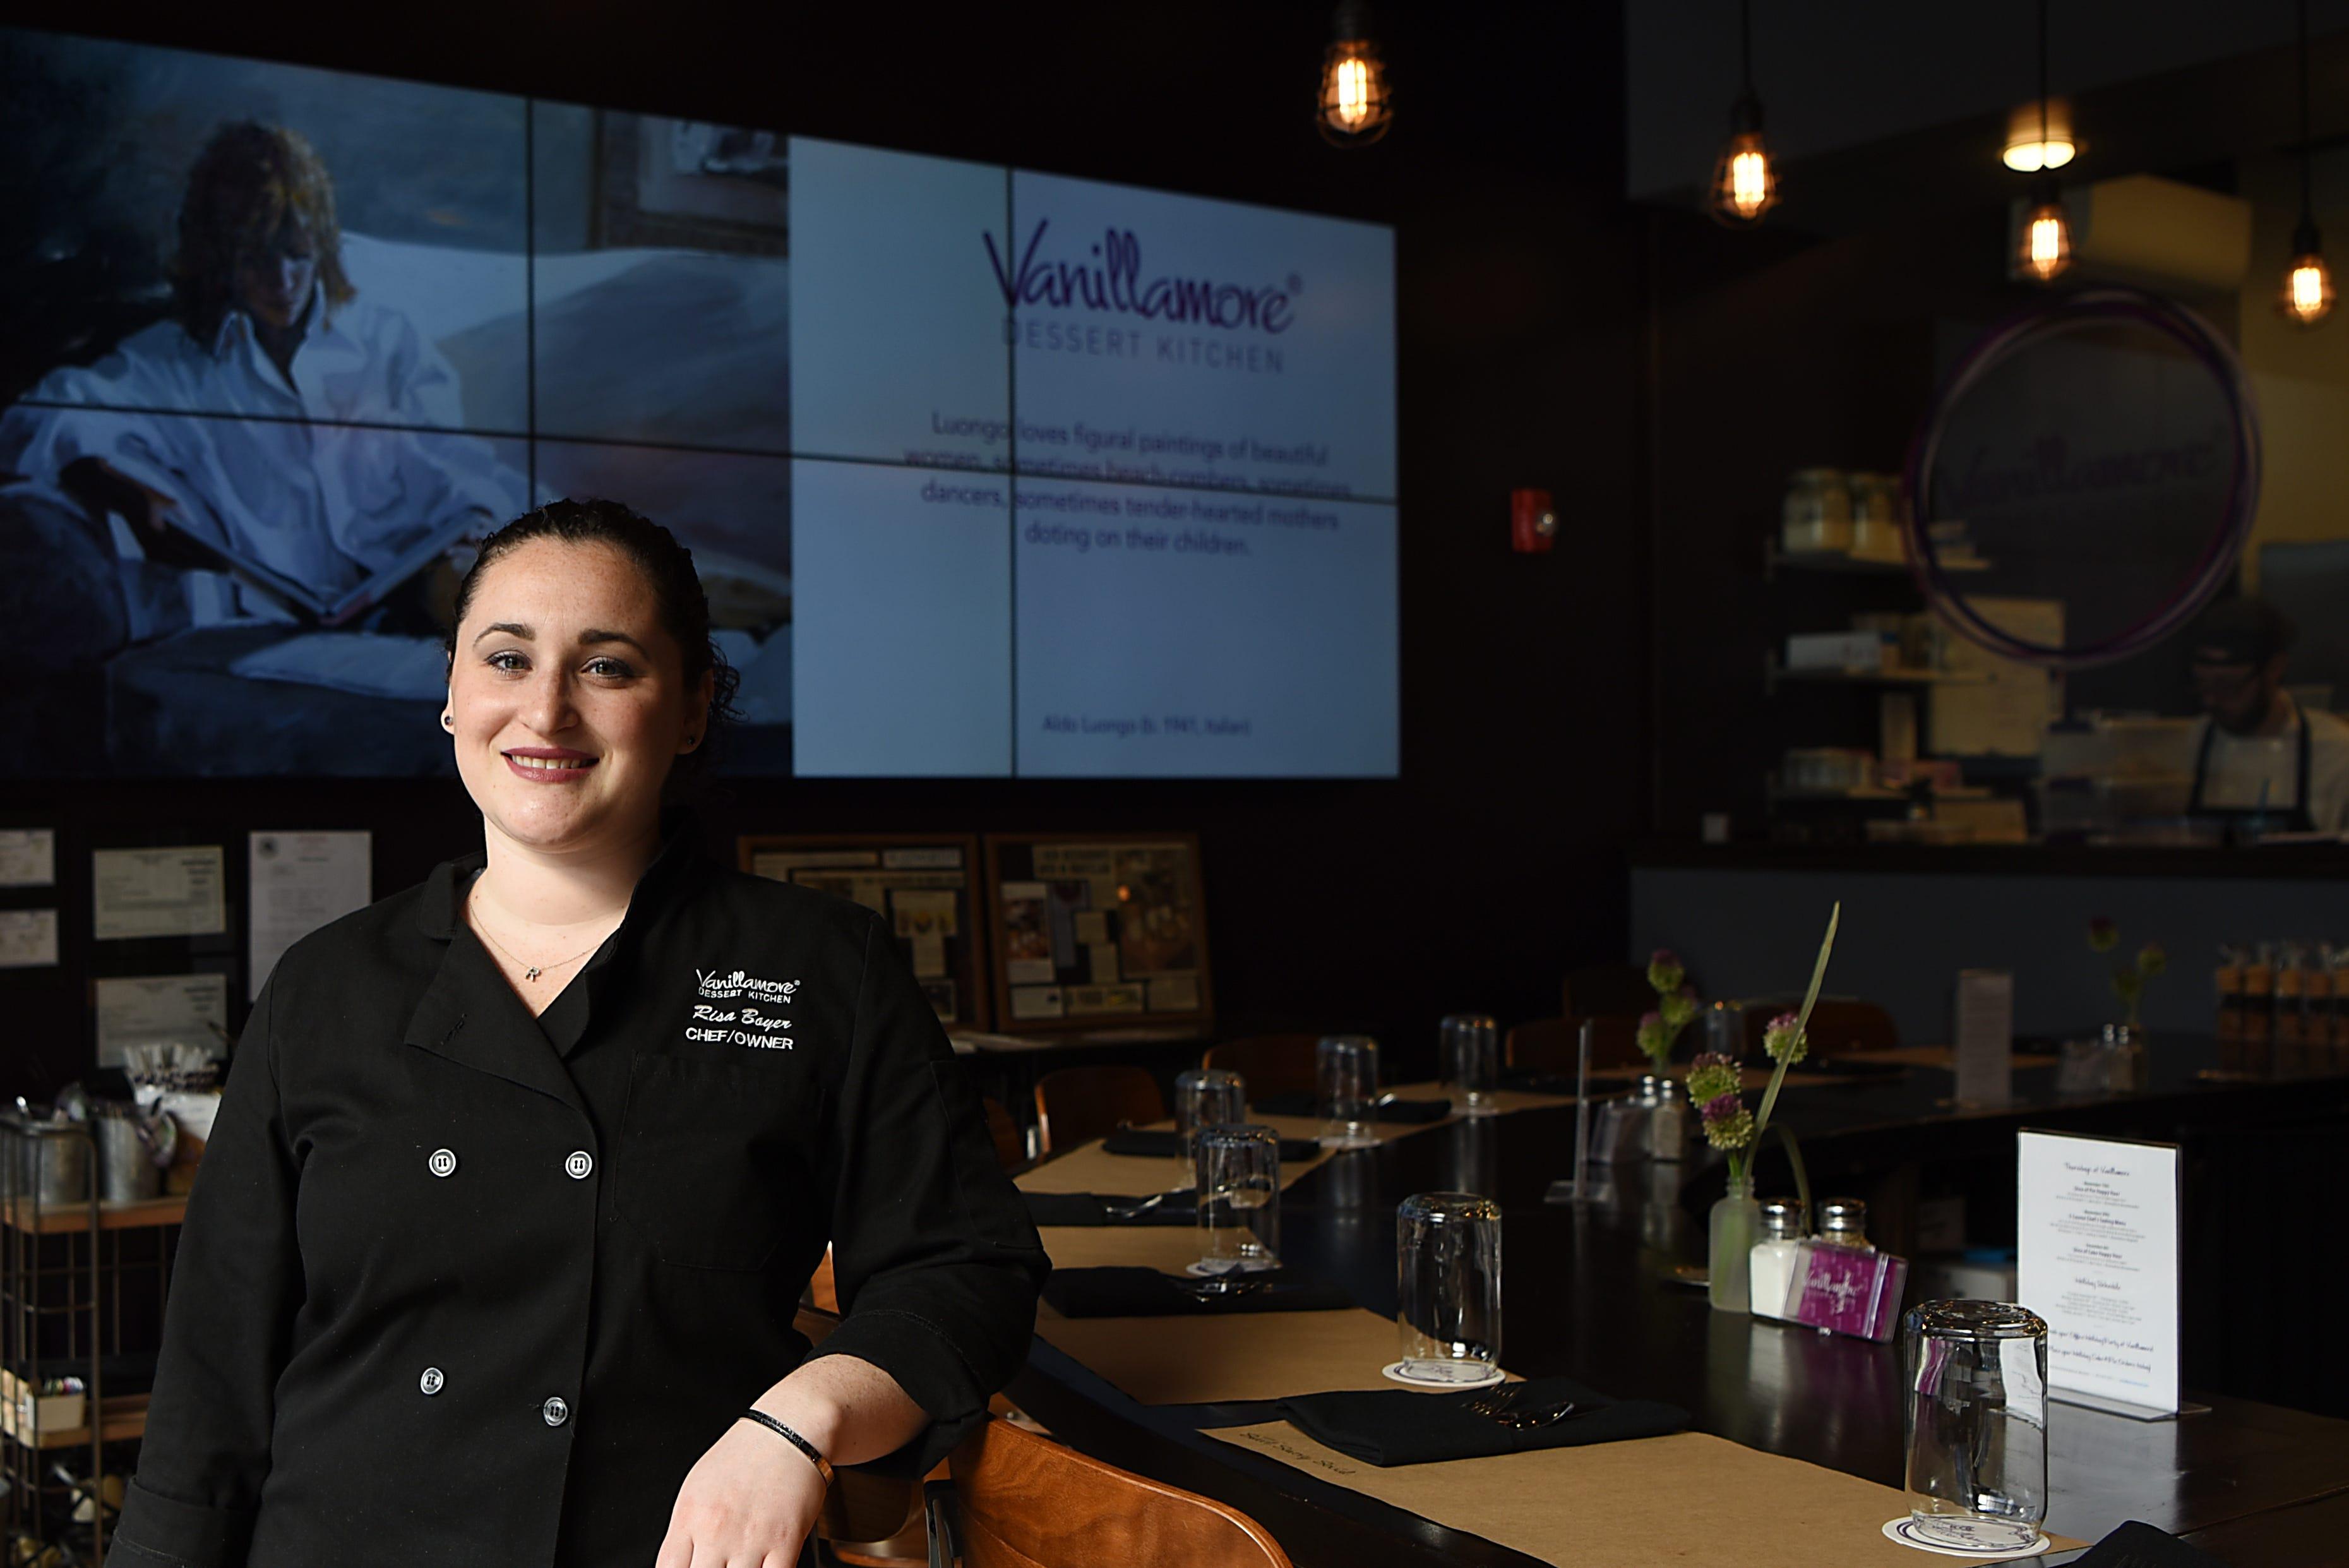 For the love of vanilla: Vanillamore in Montclair